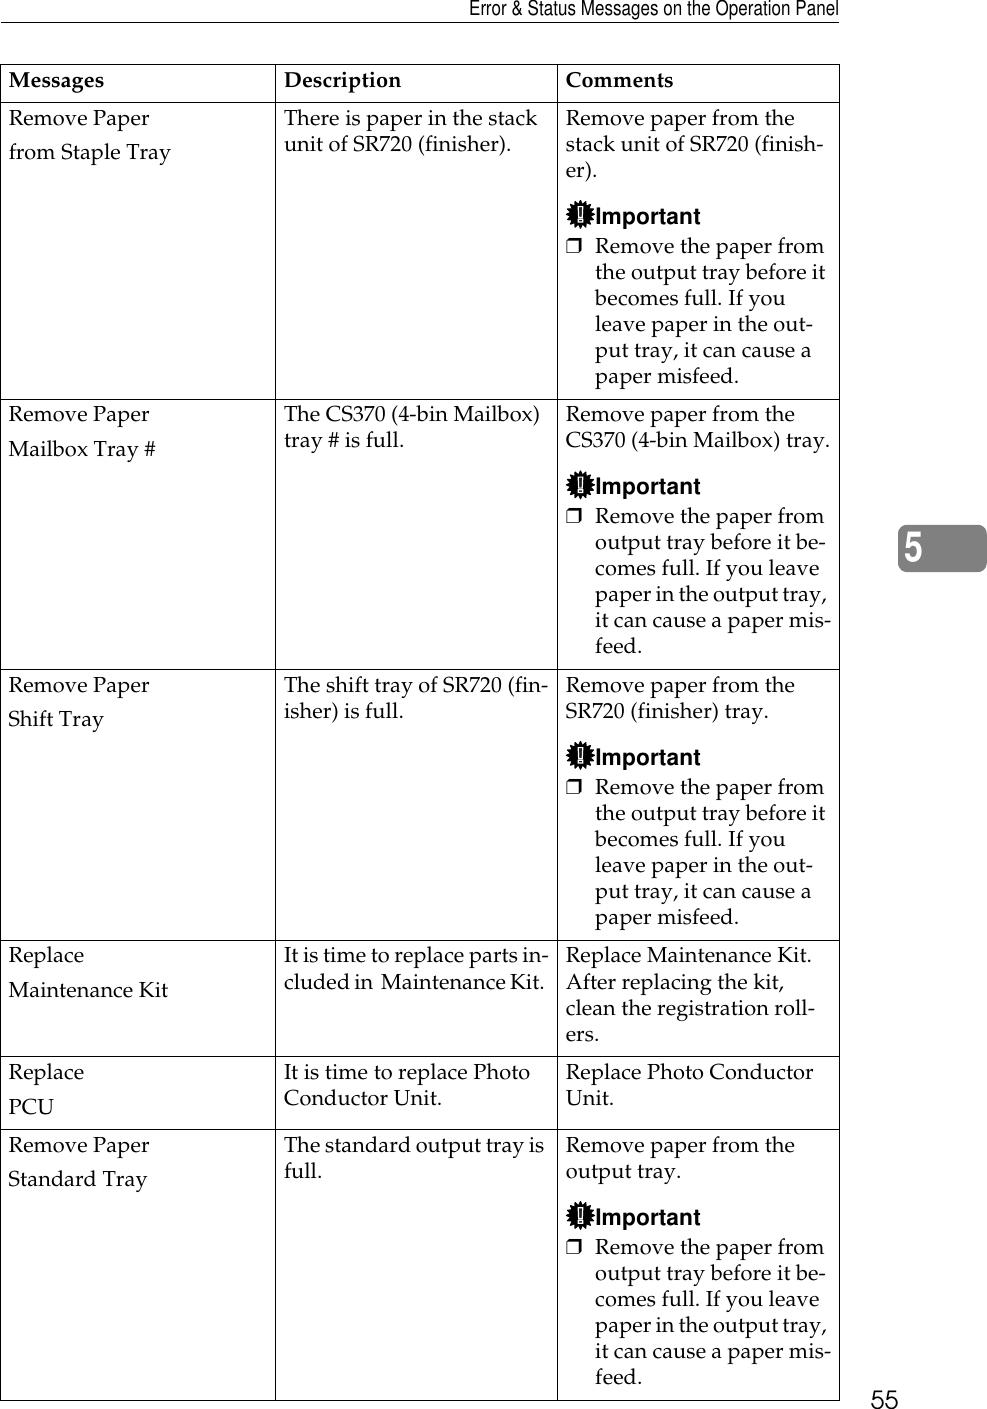 Ricoh Aficio Ap2700 Users Manual Operating Instructions